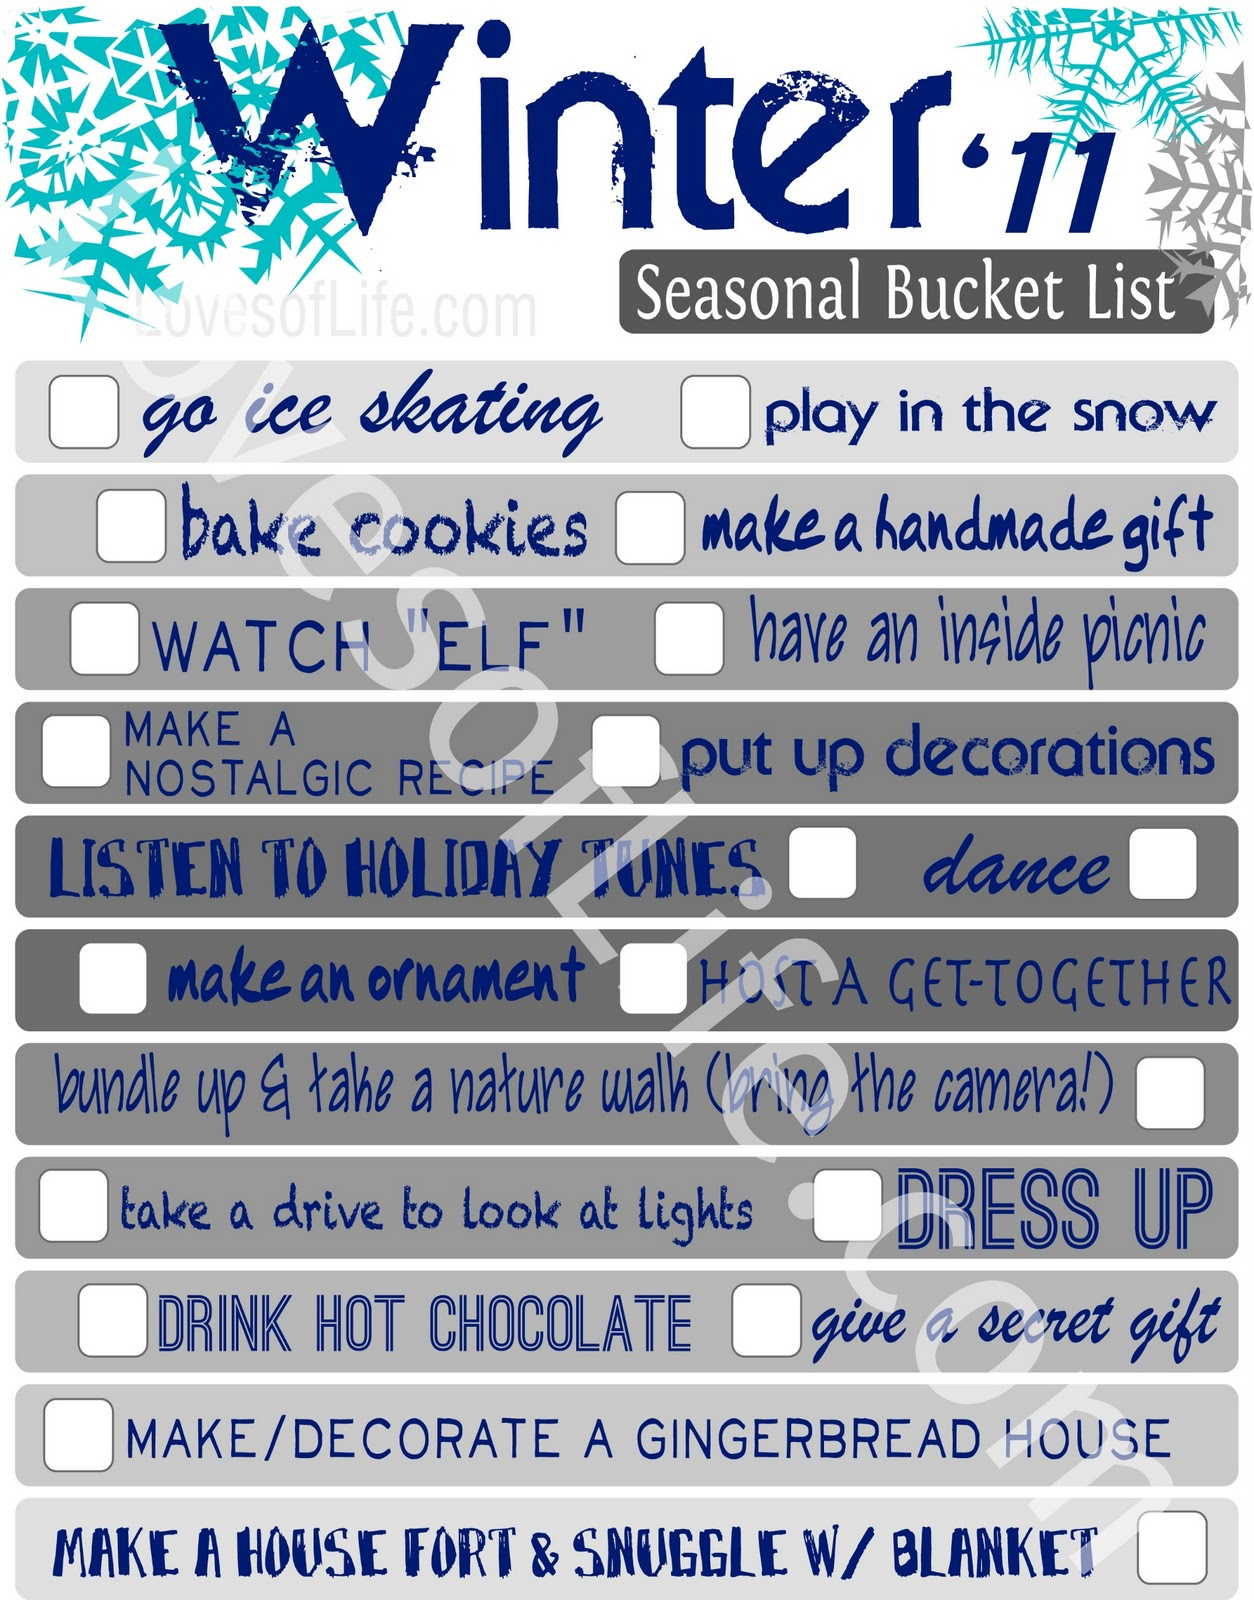 Loves of Life: Winter Bucket List Printable